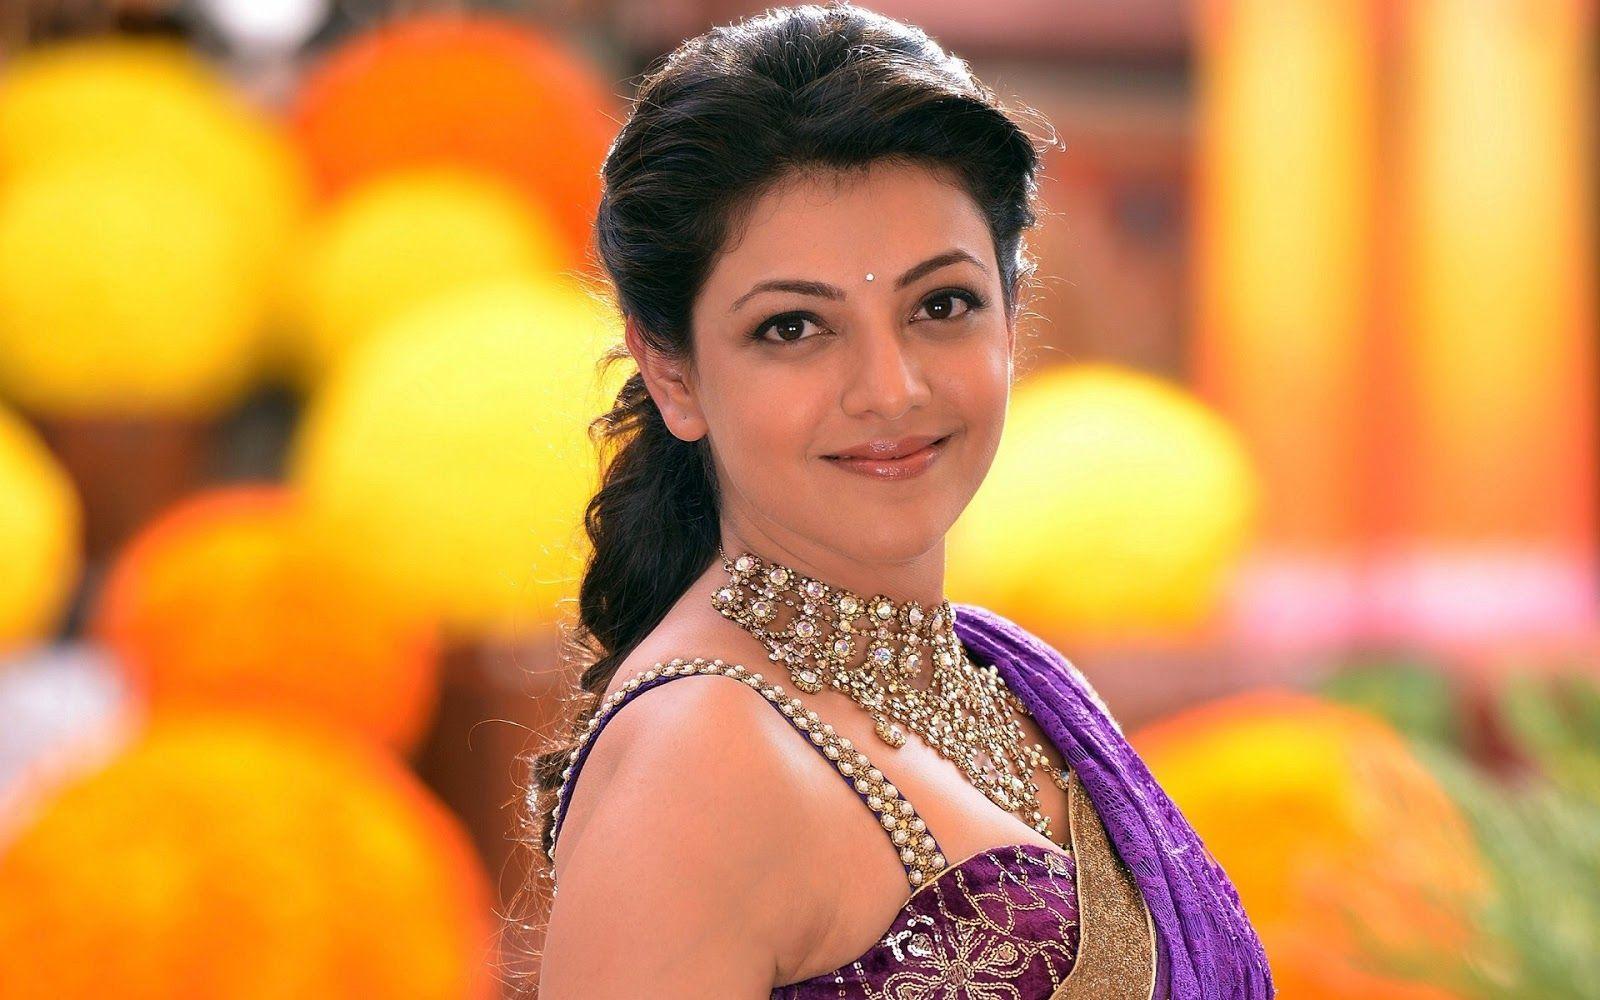 Cute Photos Of Telugu Actress Kajal Agarwal Kajal Agarwal Art